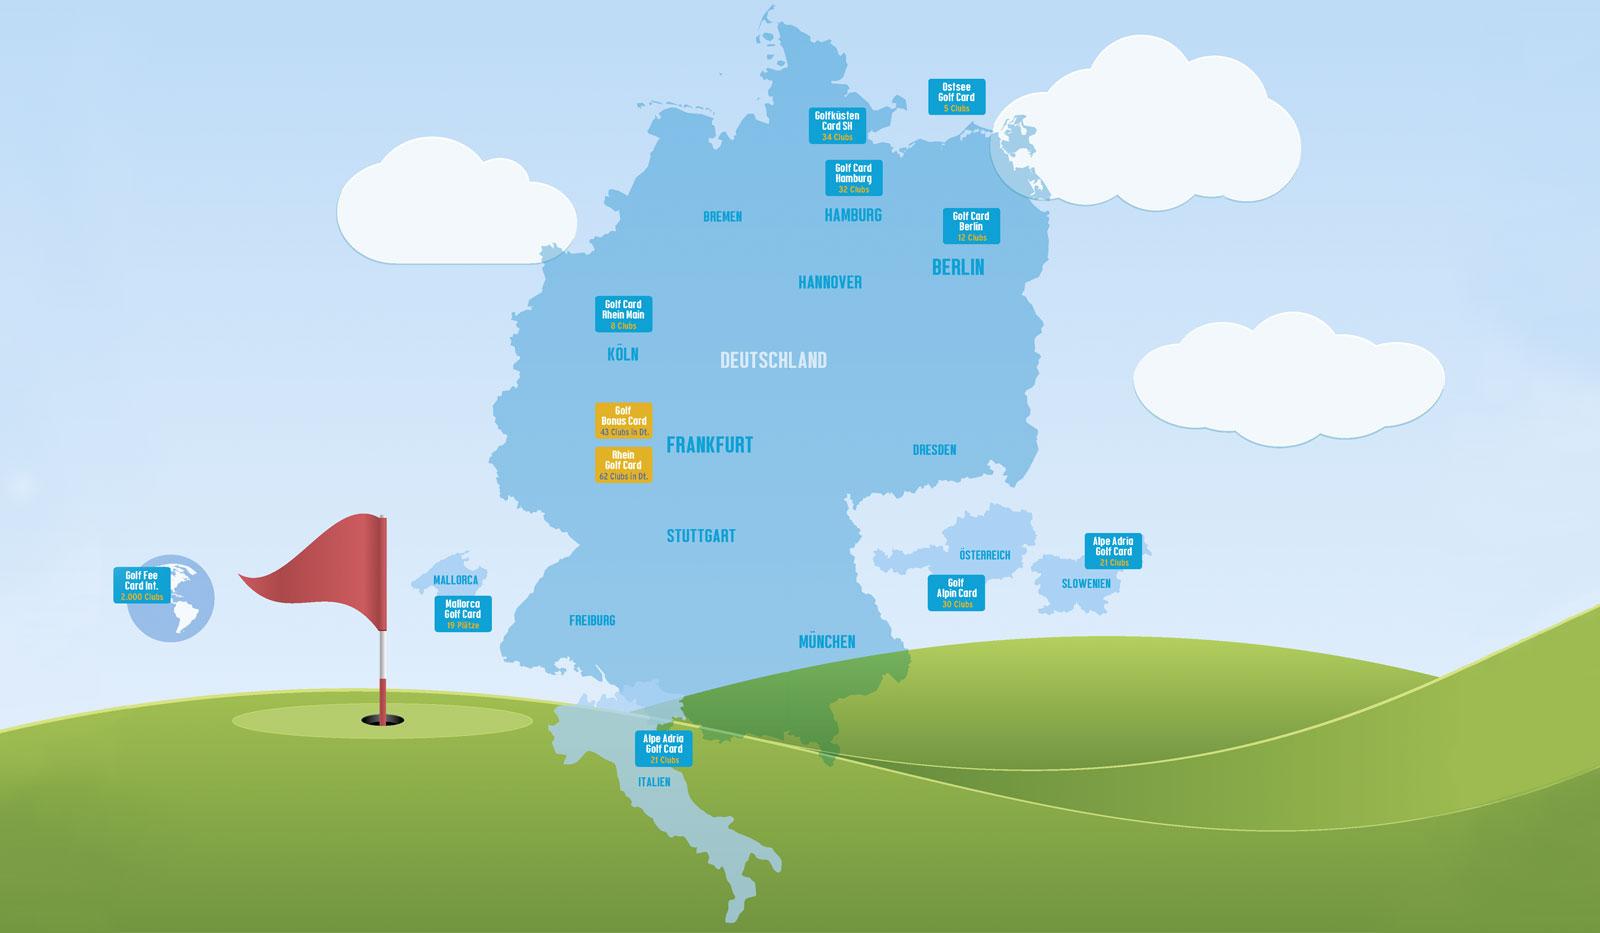 Grafik- Karte mit Infos wo GolfCard Clubs sind